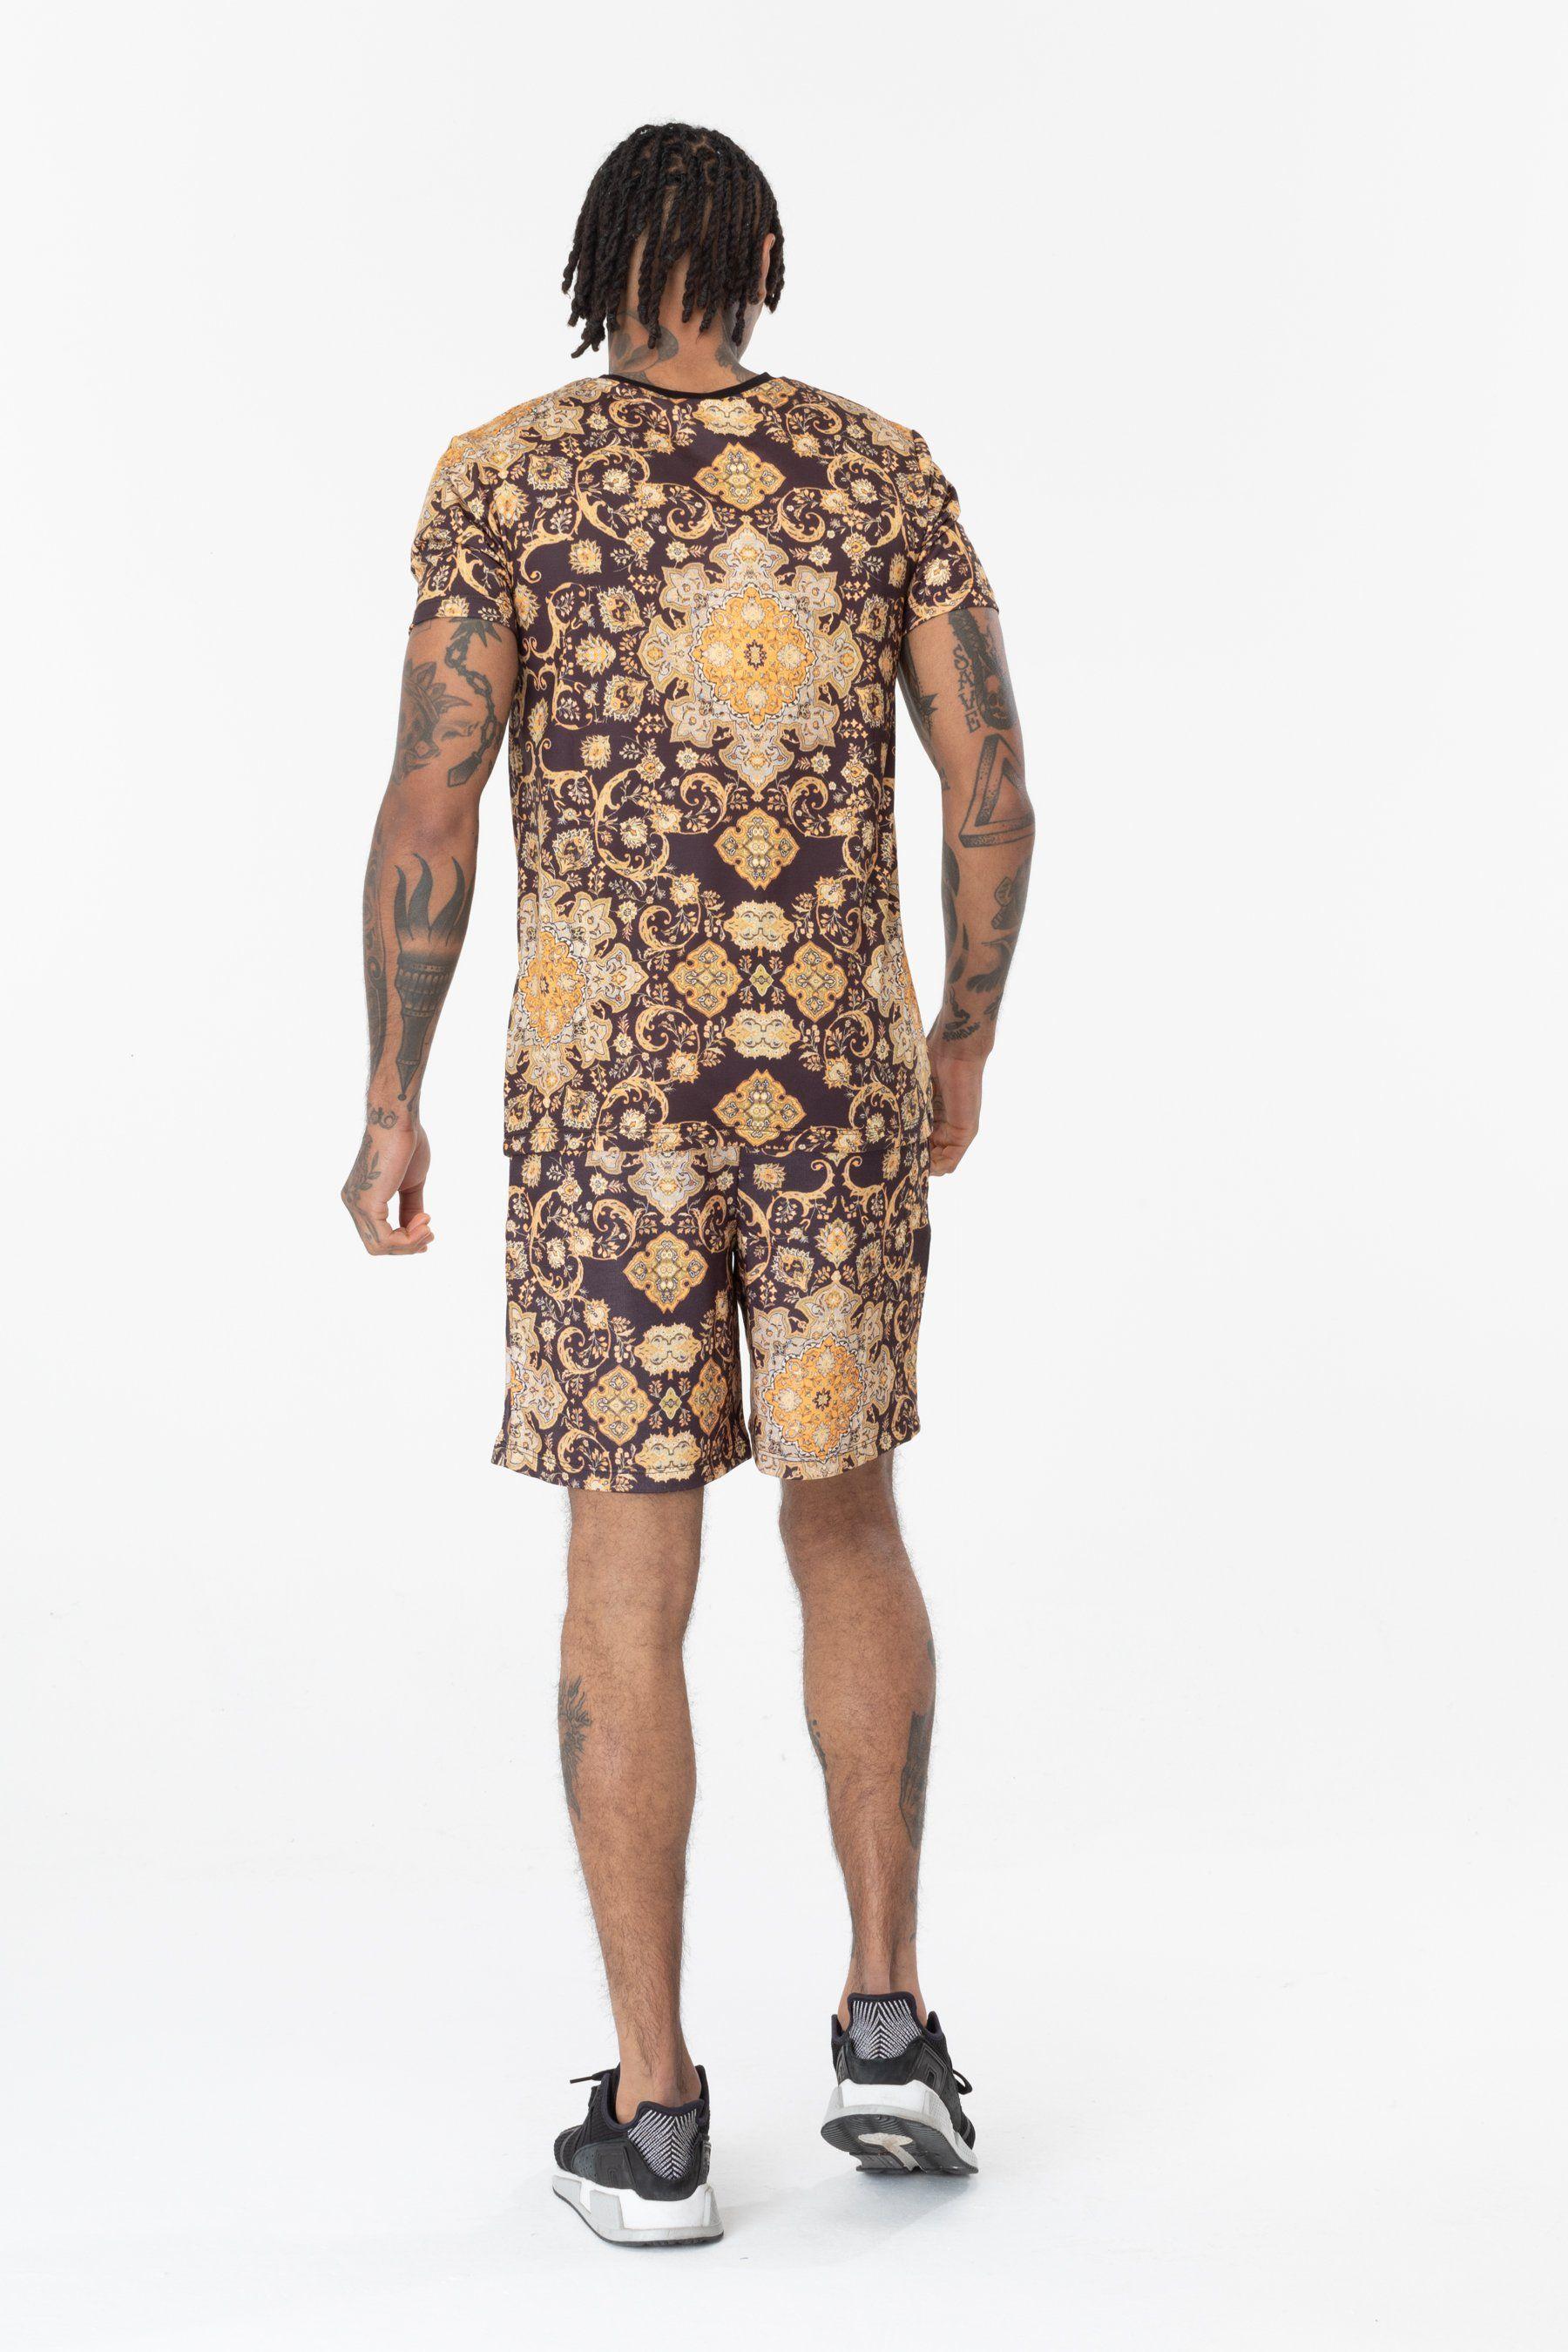 Hype Sace Mens Shorts